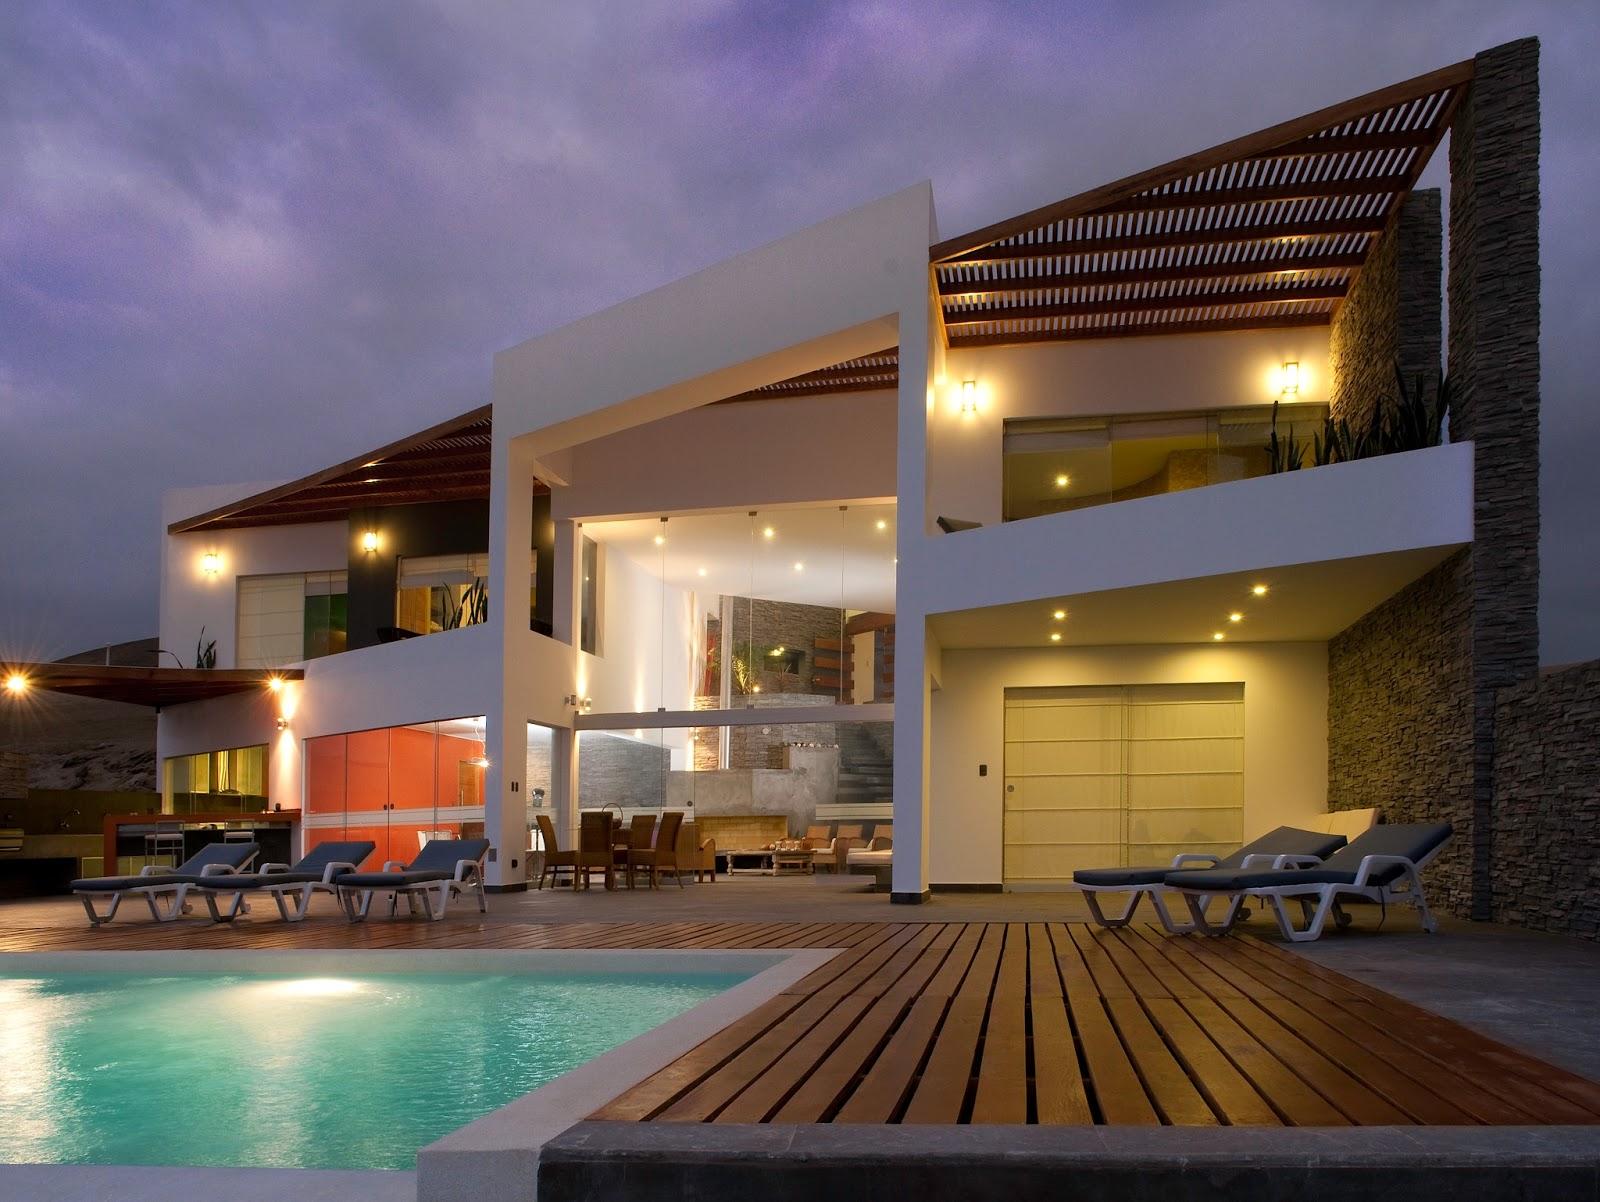 Bit cora arquitectura peruana ganadores concurso casas de - Casa de playa ...